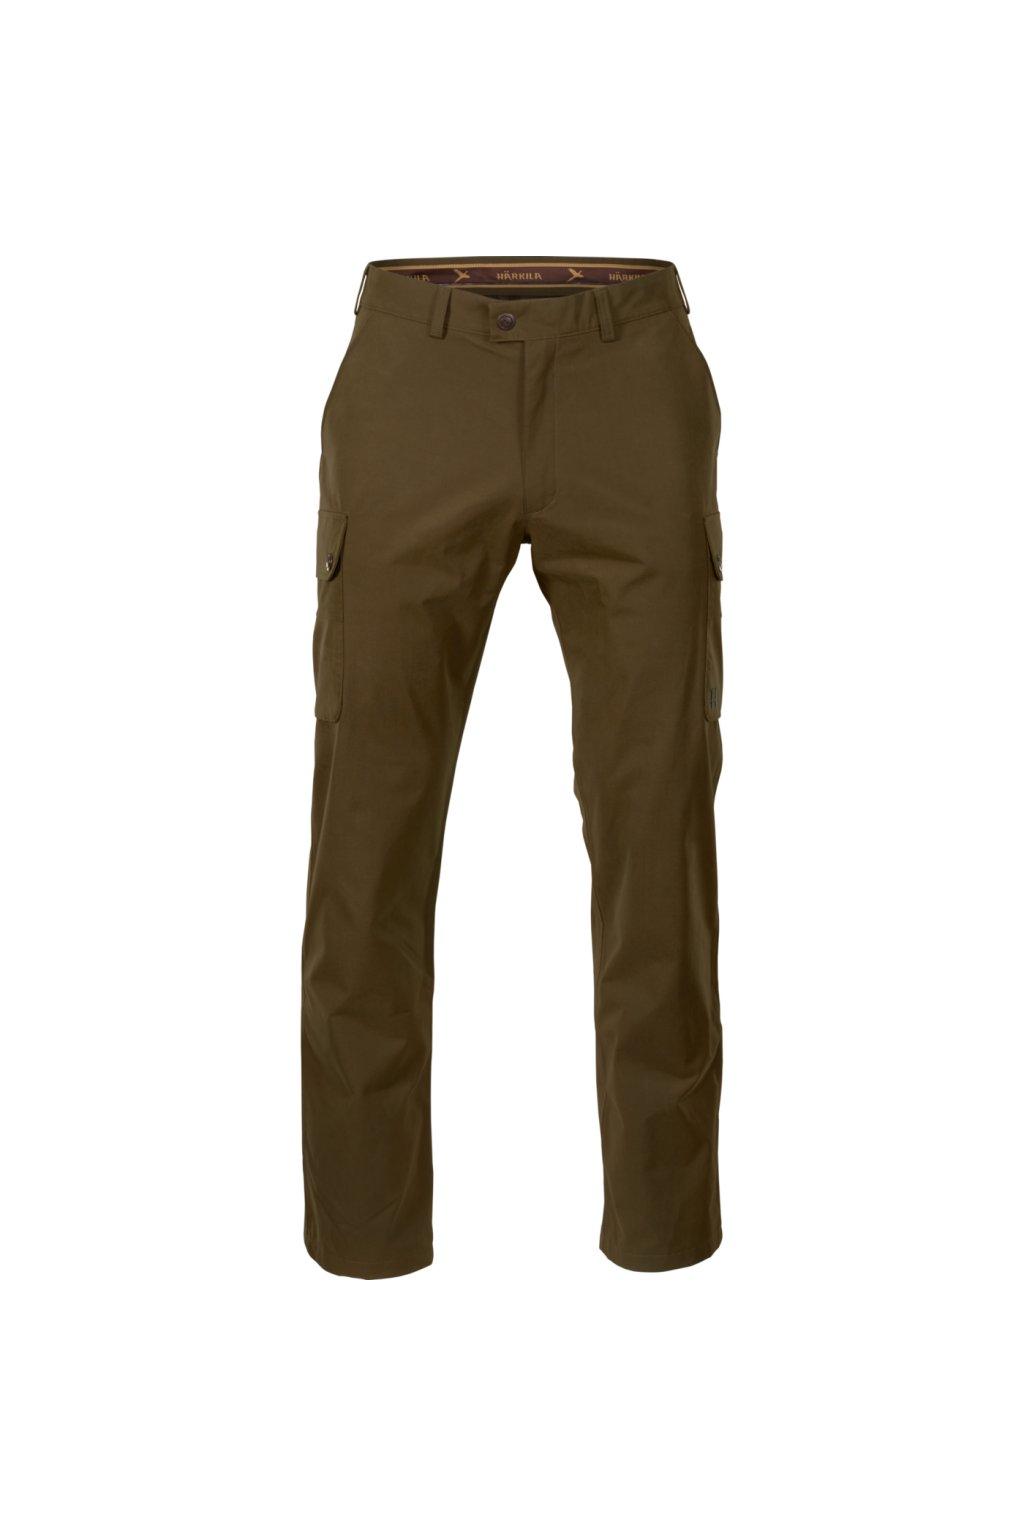 HÄRKILA - Retrieve kalhoty pánské